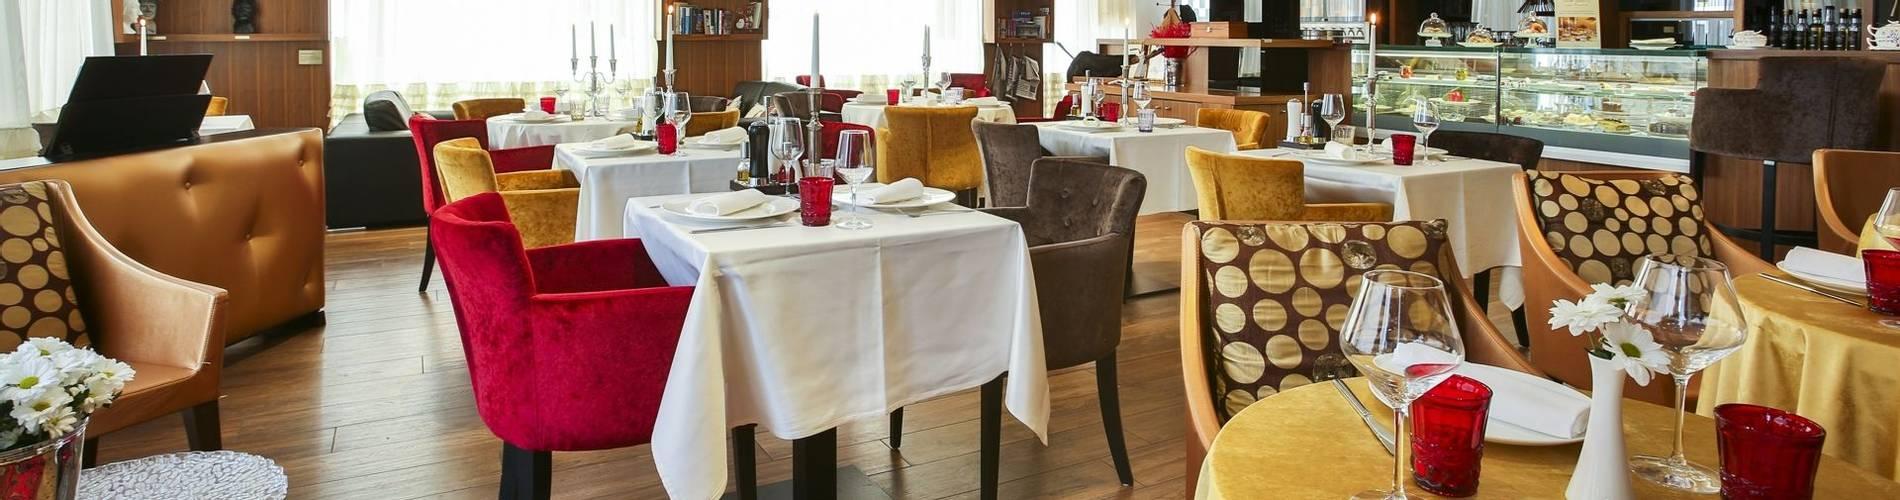 Heritage-Marmont-restaurant-Completely-Croatia.jpg